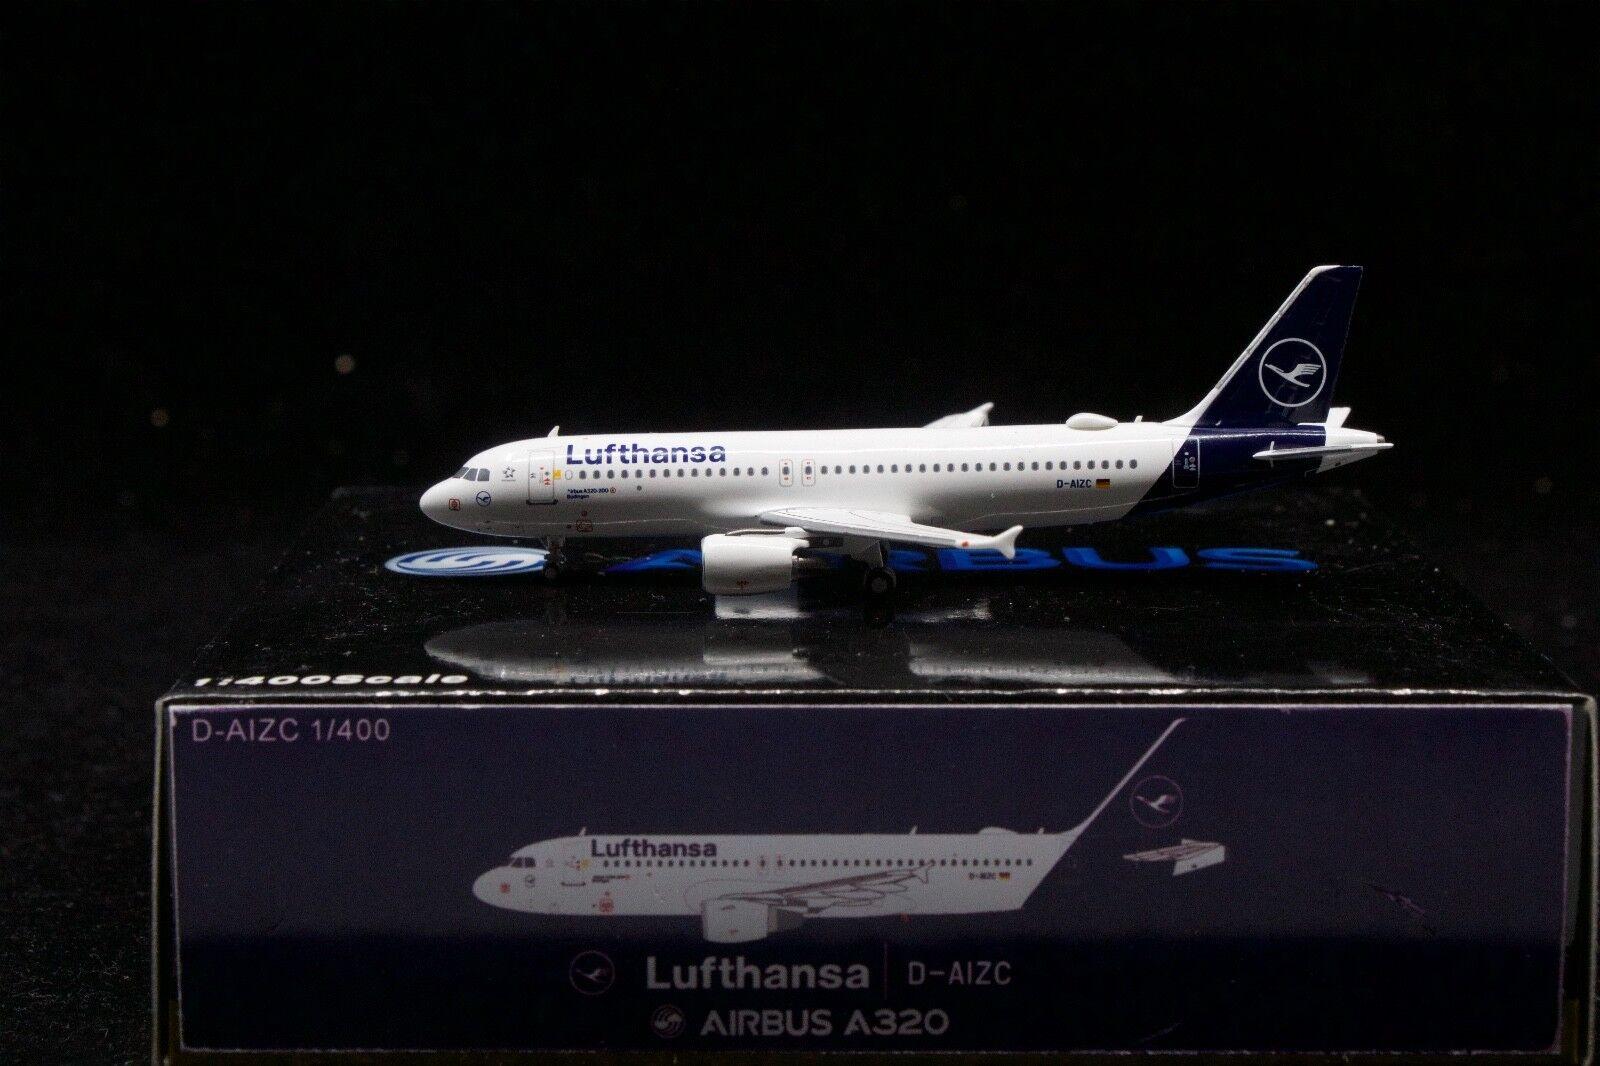 Panda Models 1 400 Lufthansa A320-200 'Budingen' D-AIZC